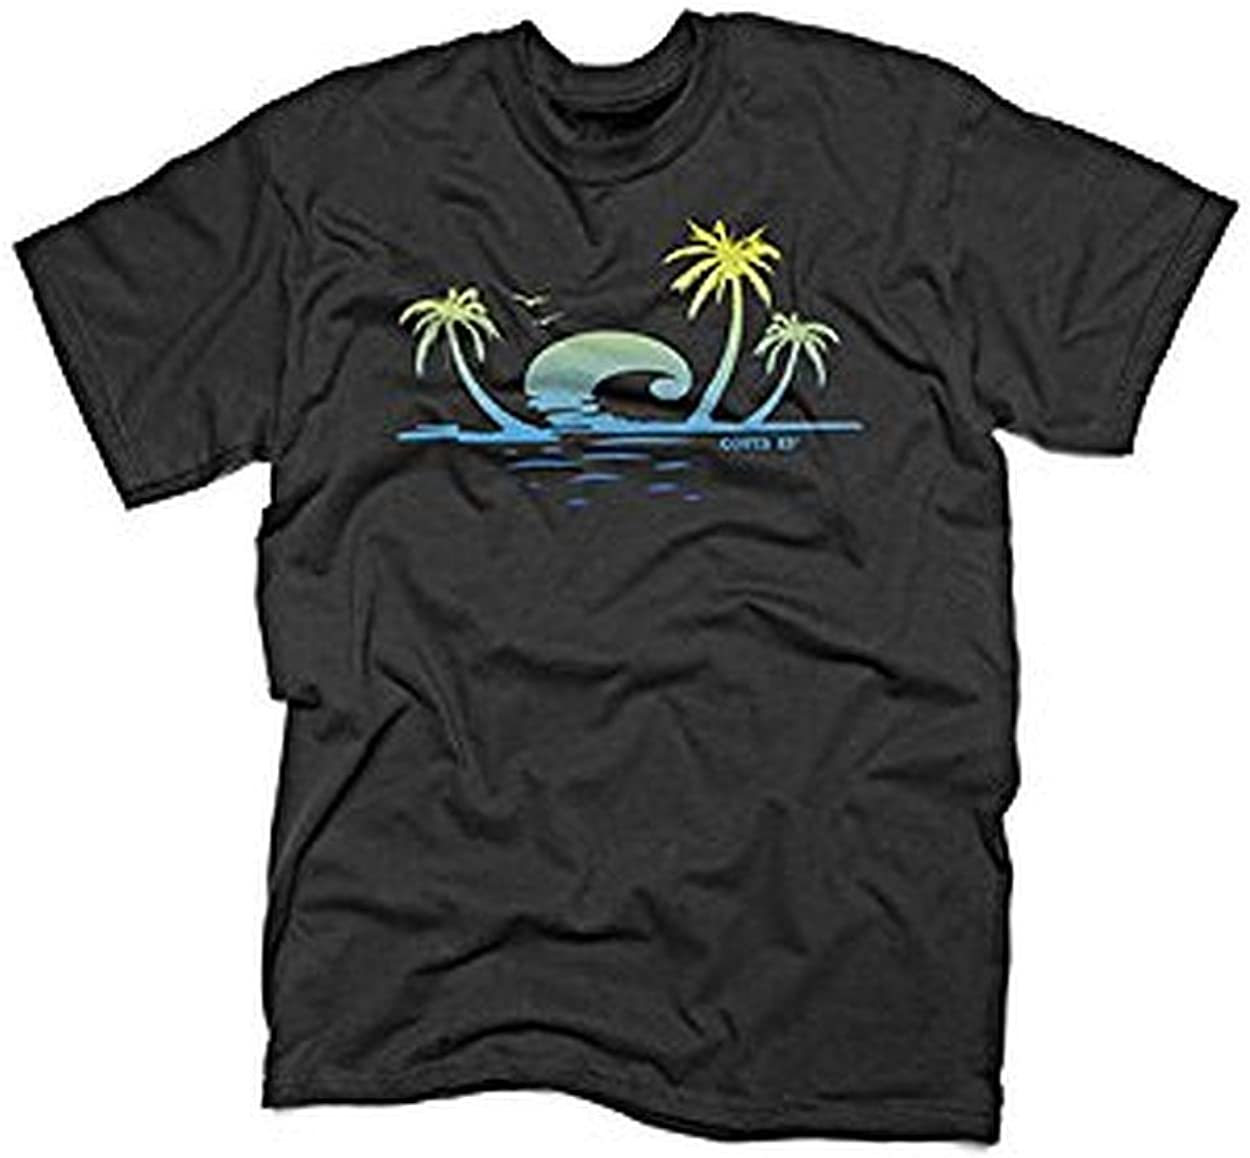 Costa Del Mar Sunrise Short Sleeve T-Shirt